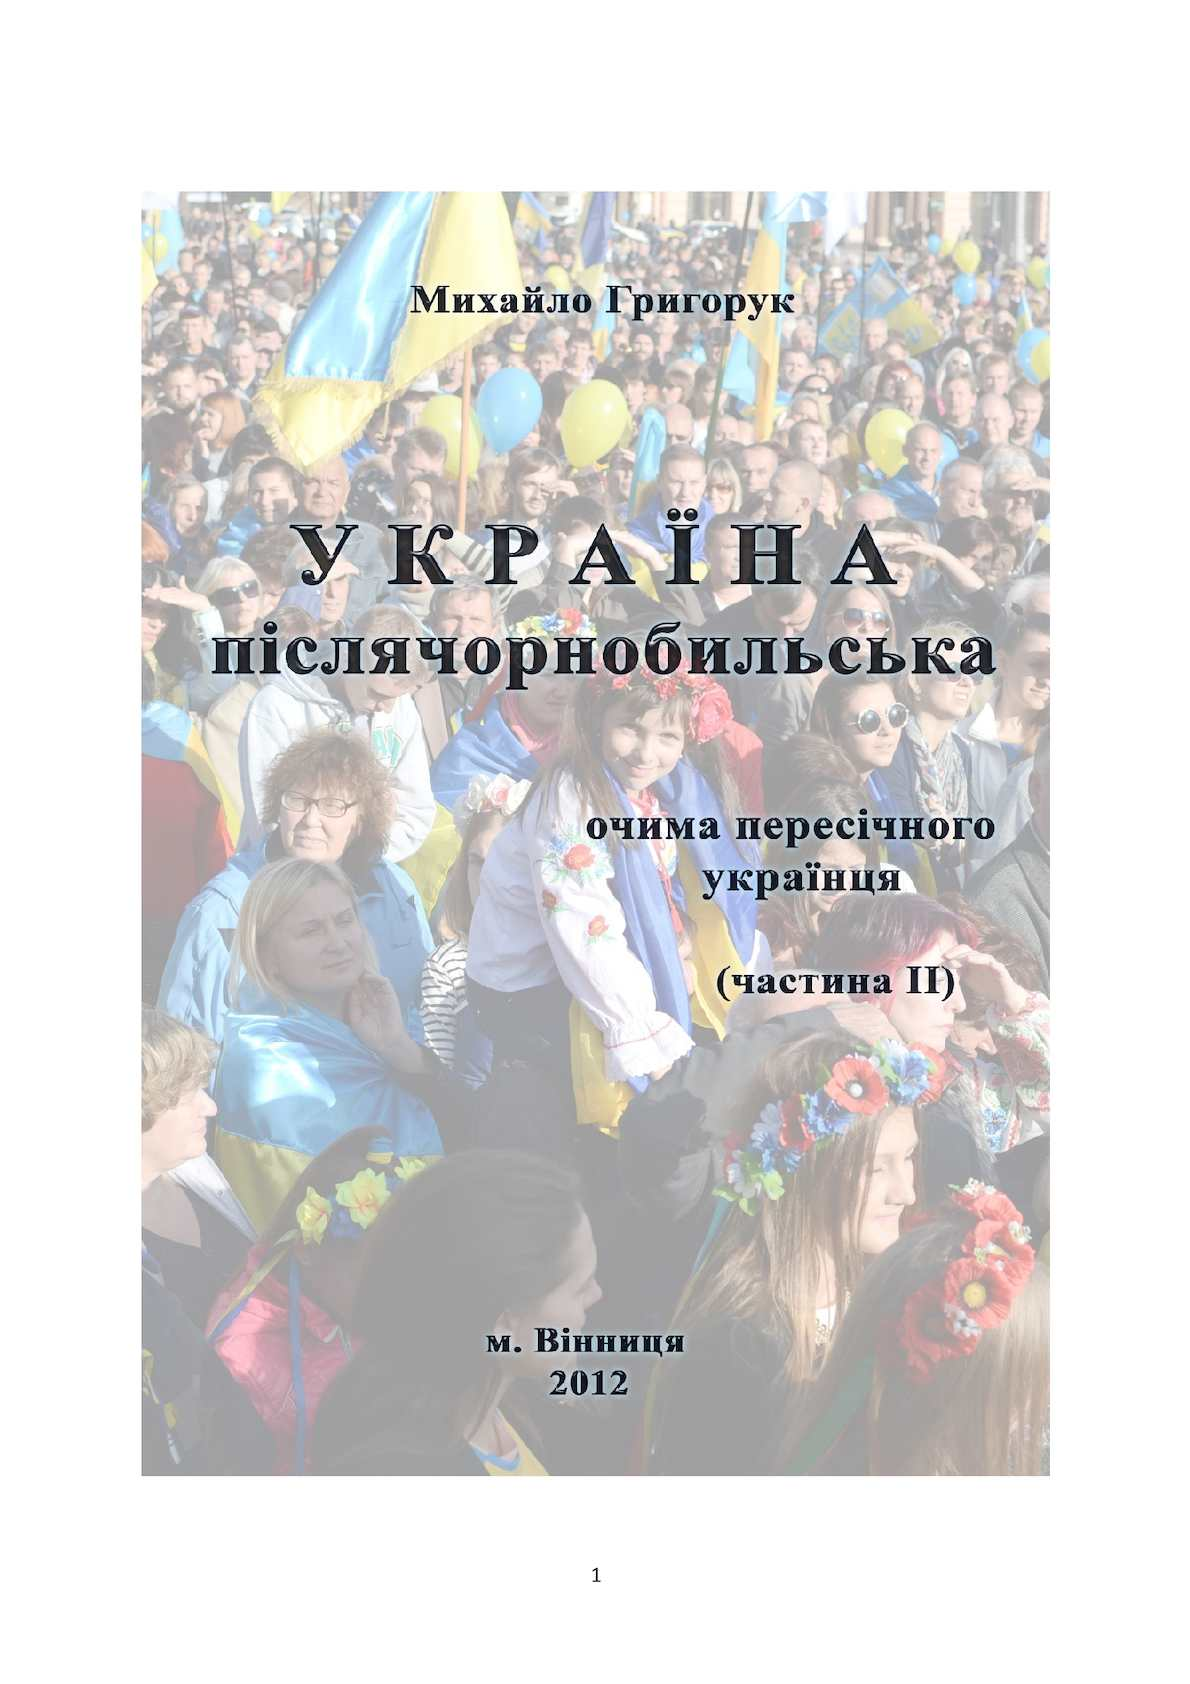 Михайло Григорук. У К Р А Ї Н А післячорнобильська Частина II